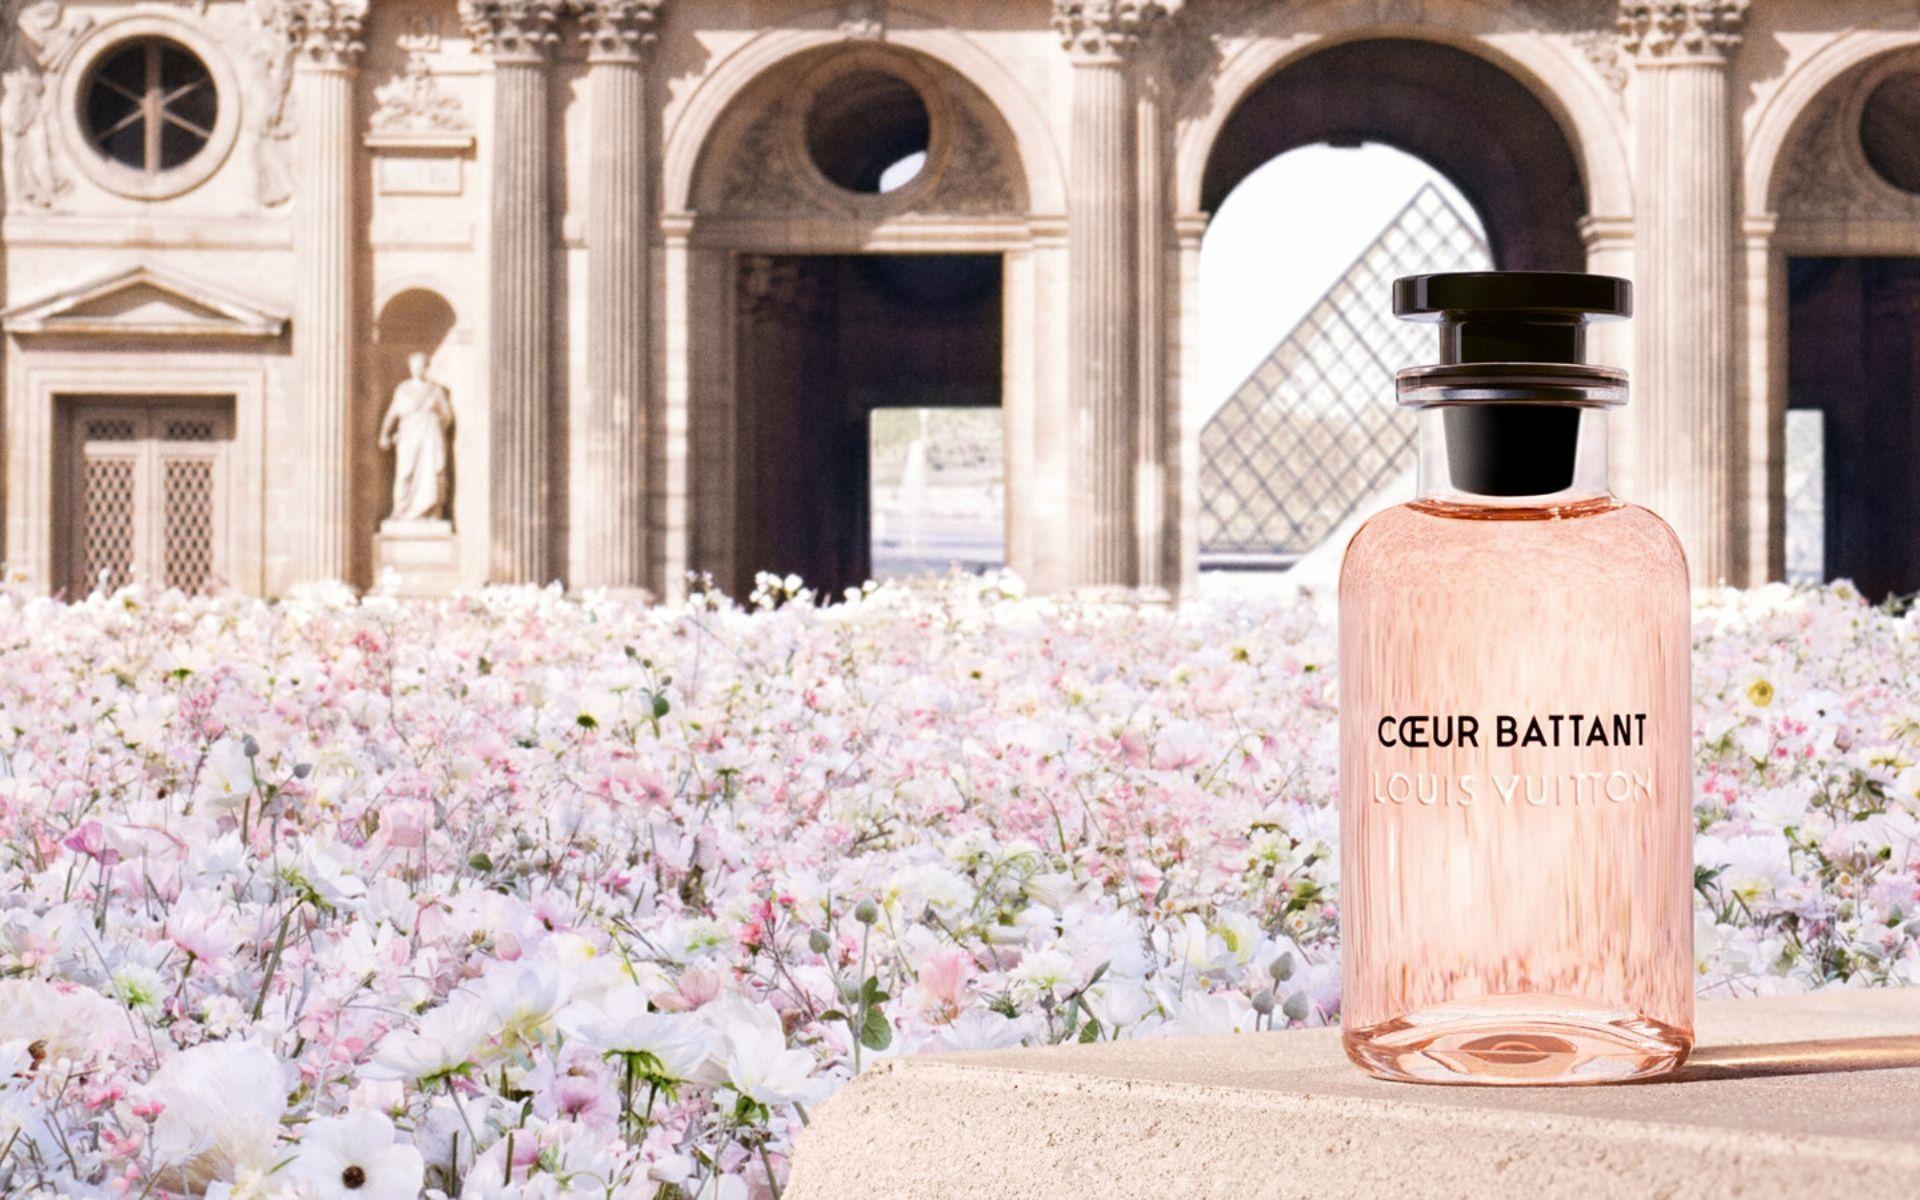 Emma Stone Stars In A Short Film For Louis Vuitton Cœur Battant Fragrance